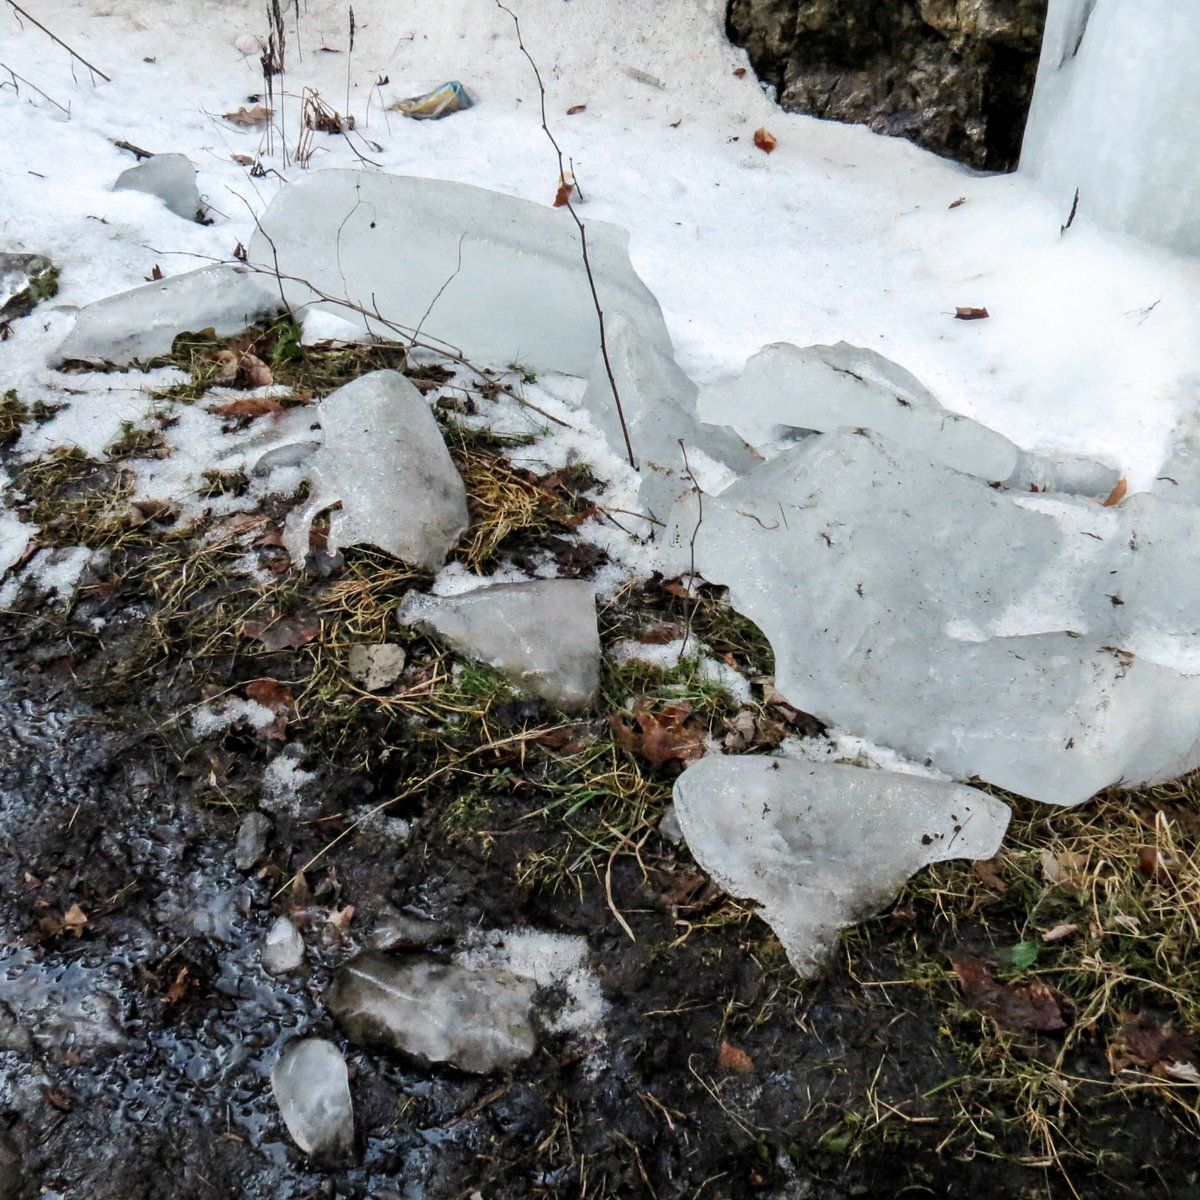 9. Fallen Ice